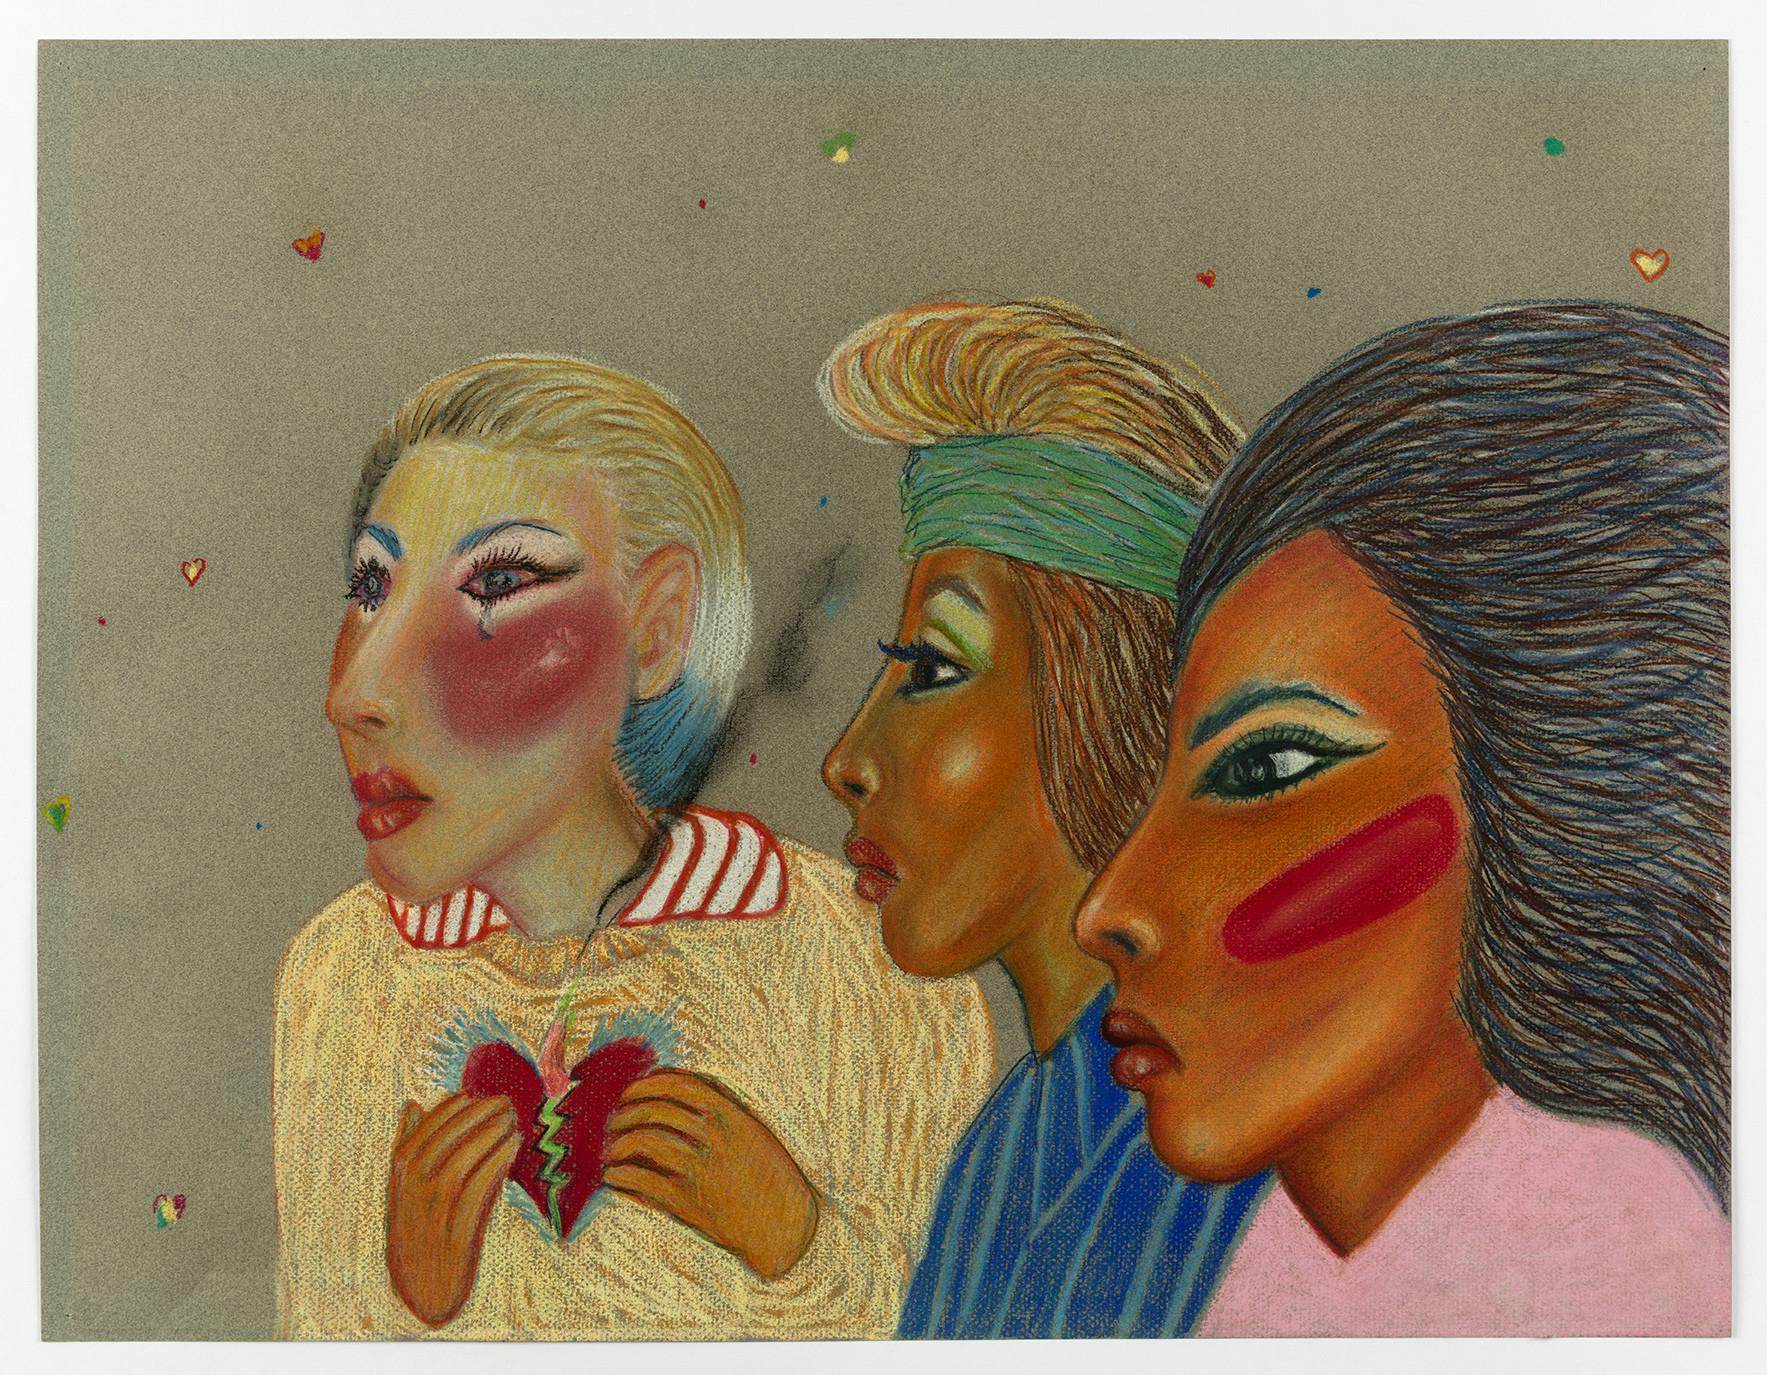 """Amor en Aztlán,"" by Gilbert 'Magu' Luján, 1988, at the University Art Galleries at UC Irvine."